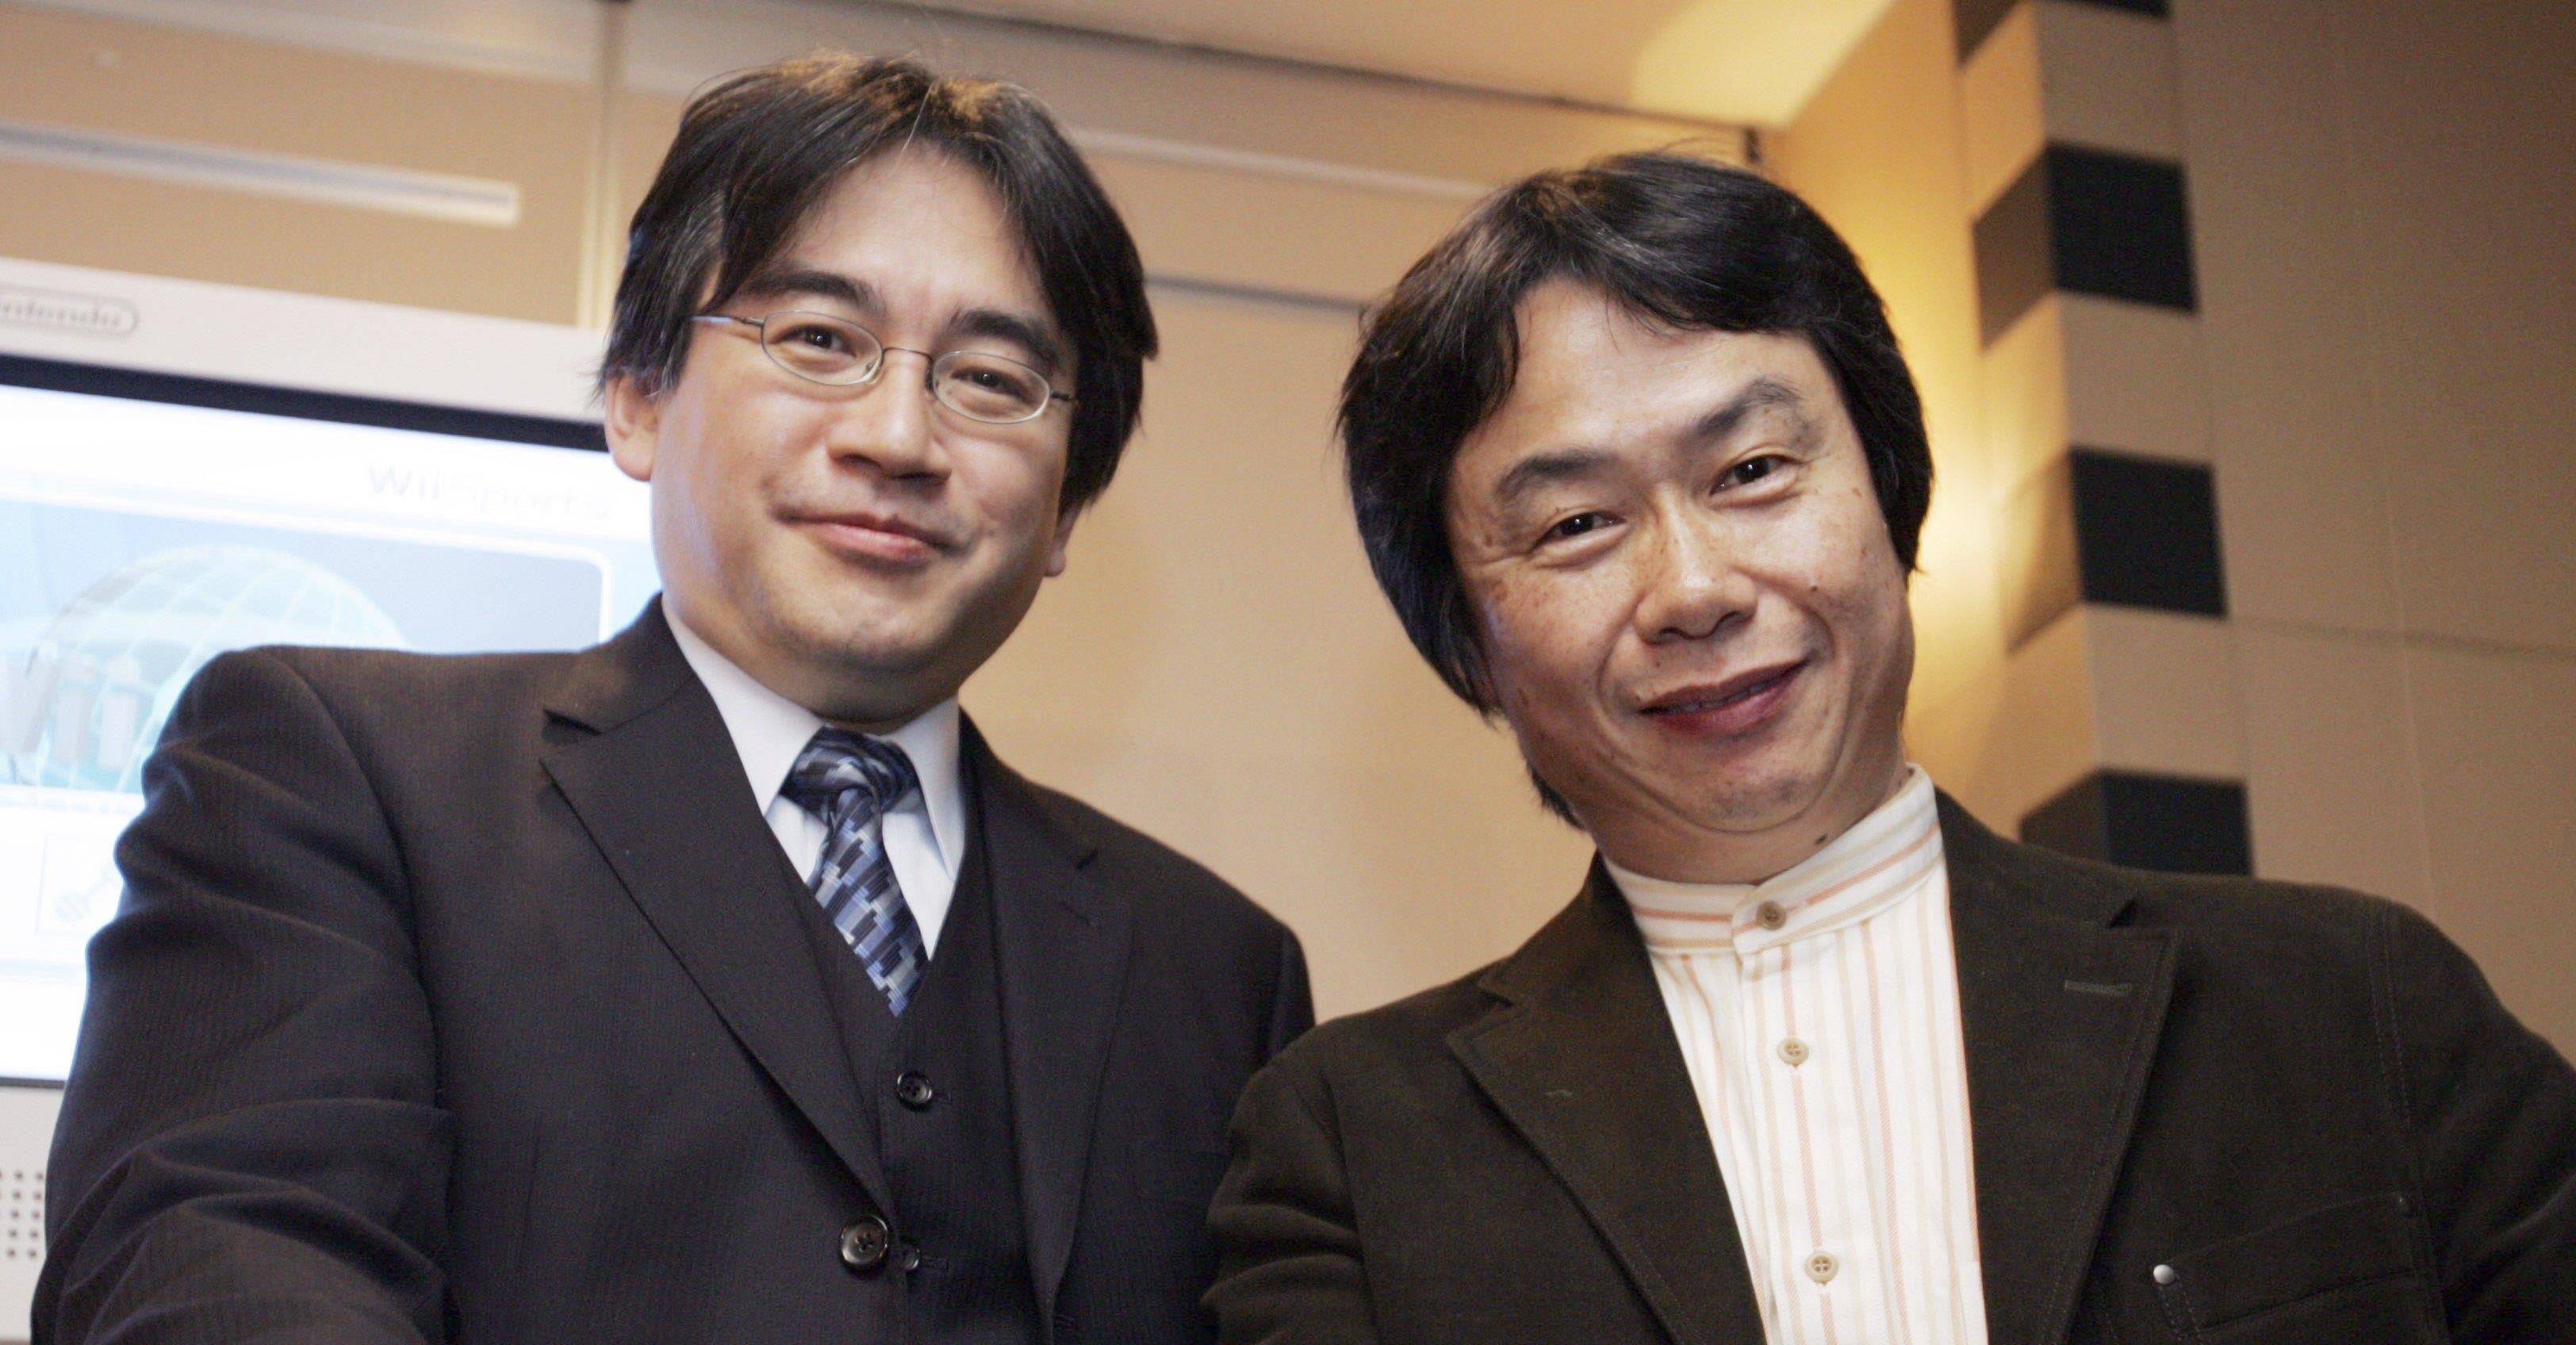 Official(?) Nintendo Consoles Music Thread v2.0 (THAT'S NUMBERWANG!) - Page 13 561636-iwata_miyamoto_header